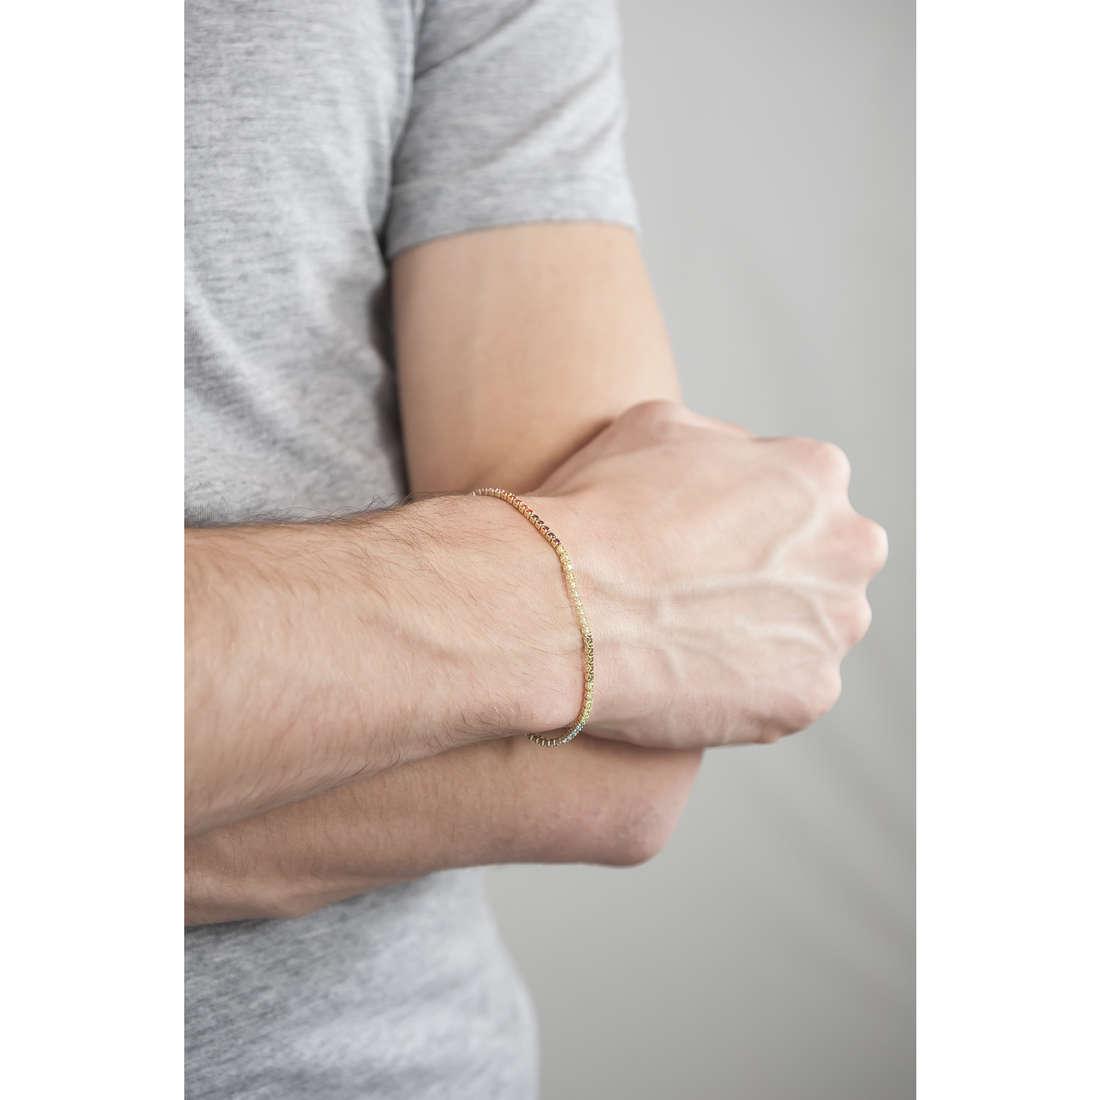 Cesare Paciotti bracelets man JPBR1235G indosso